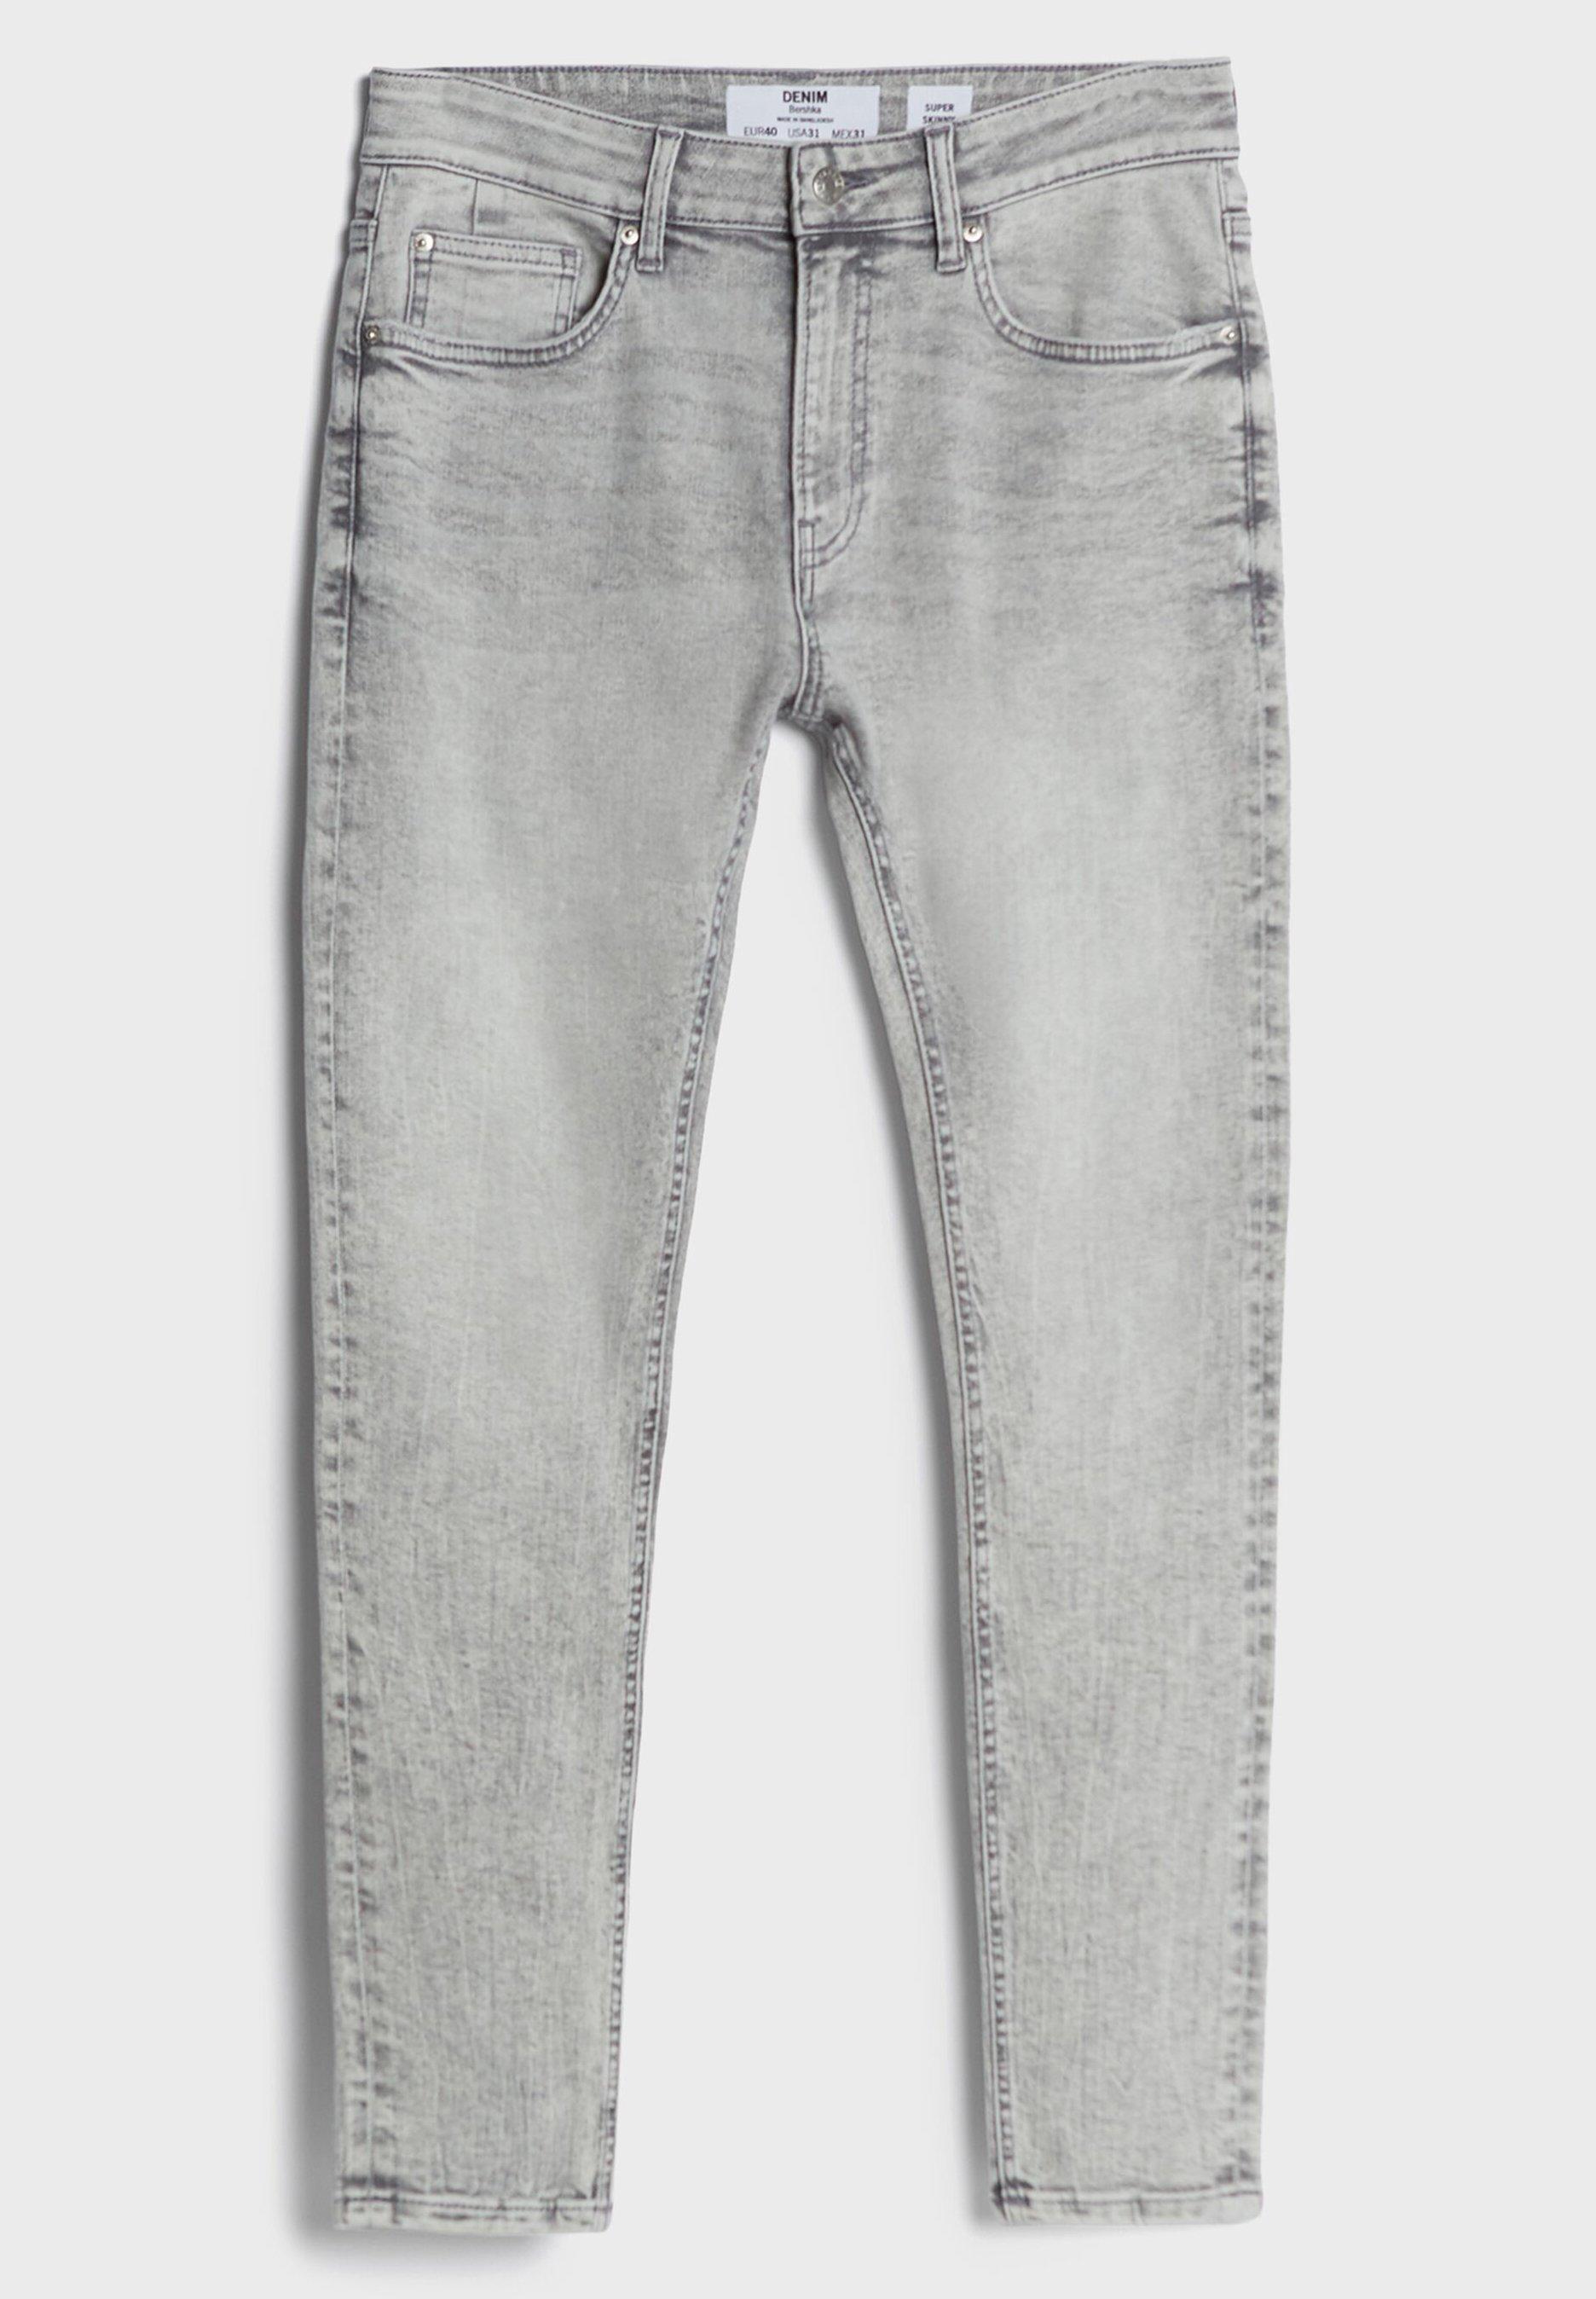 Herren Jeans Skinny Fit